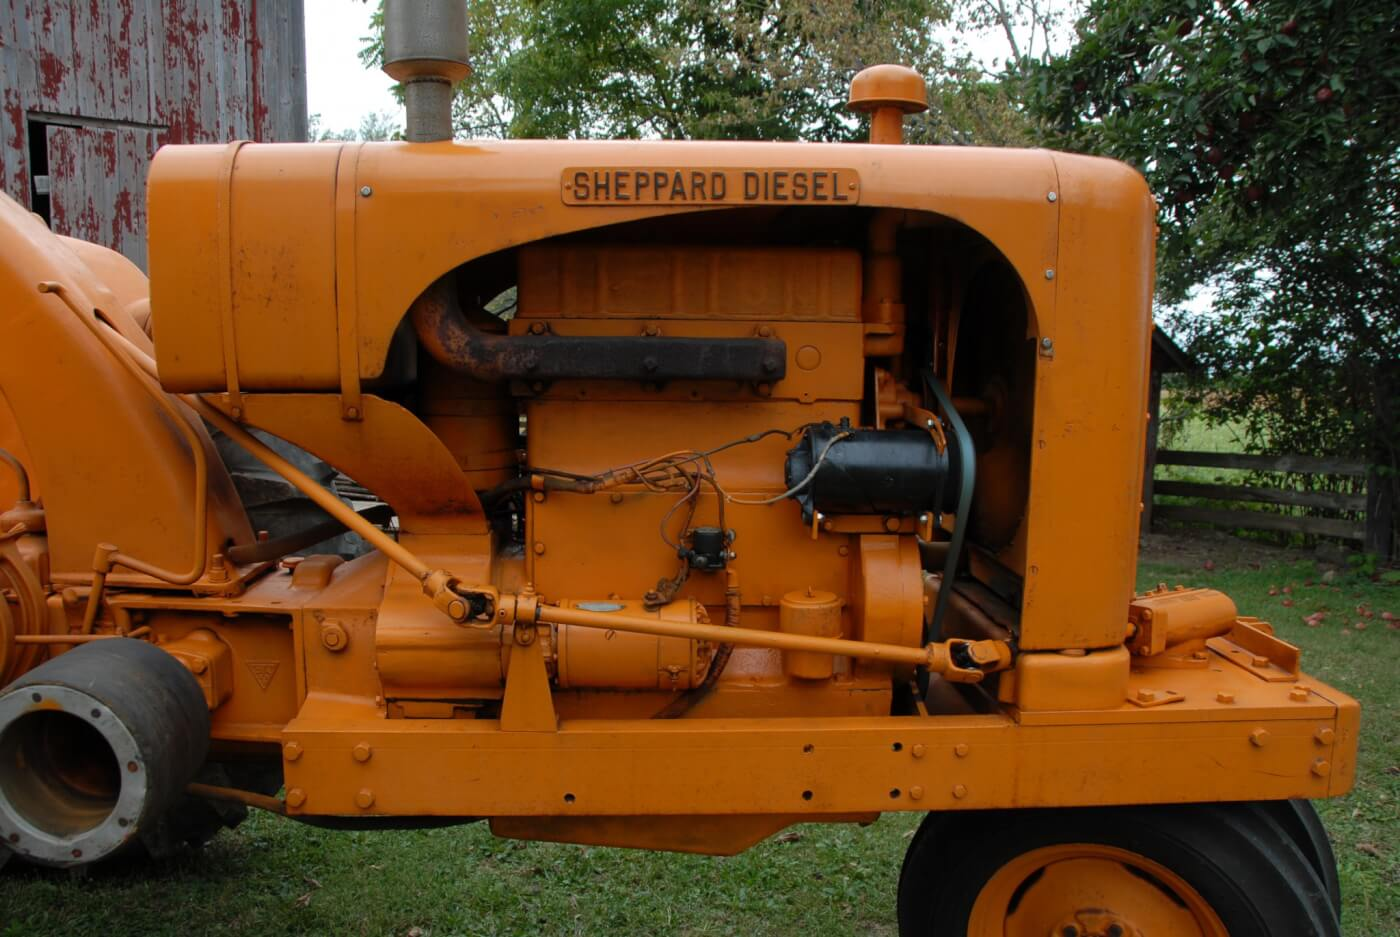 sheppard diesel tractor